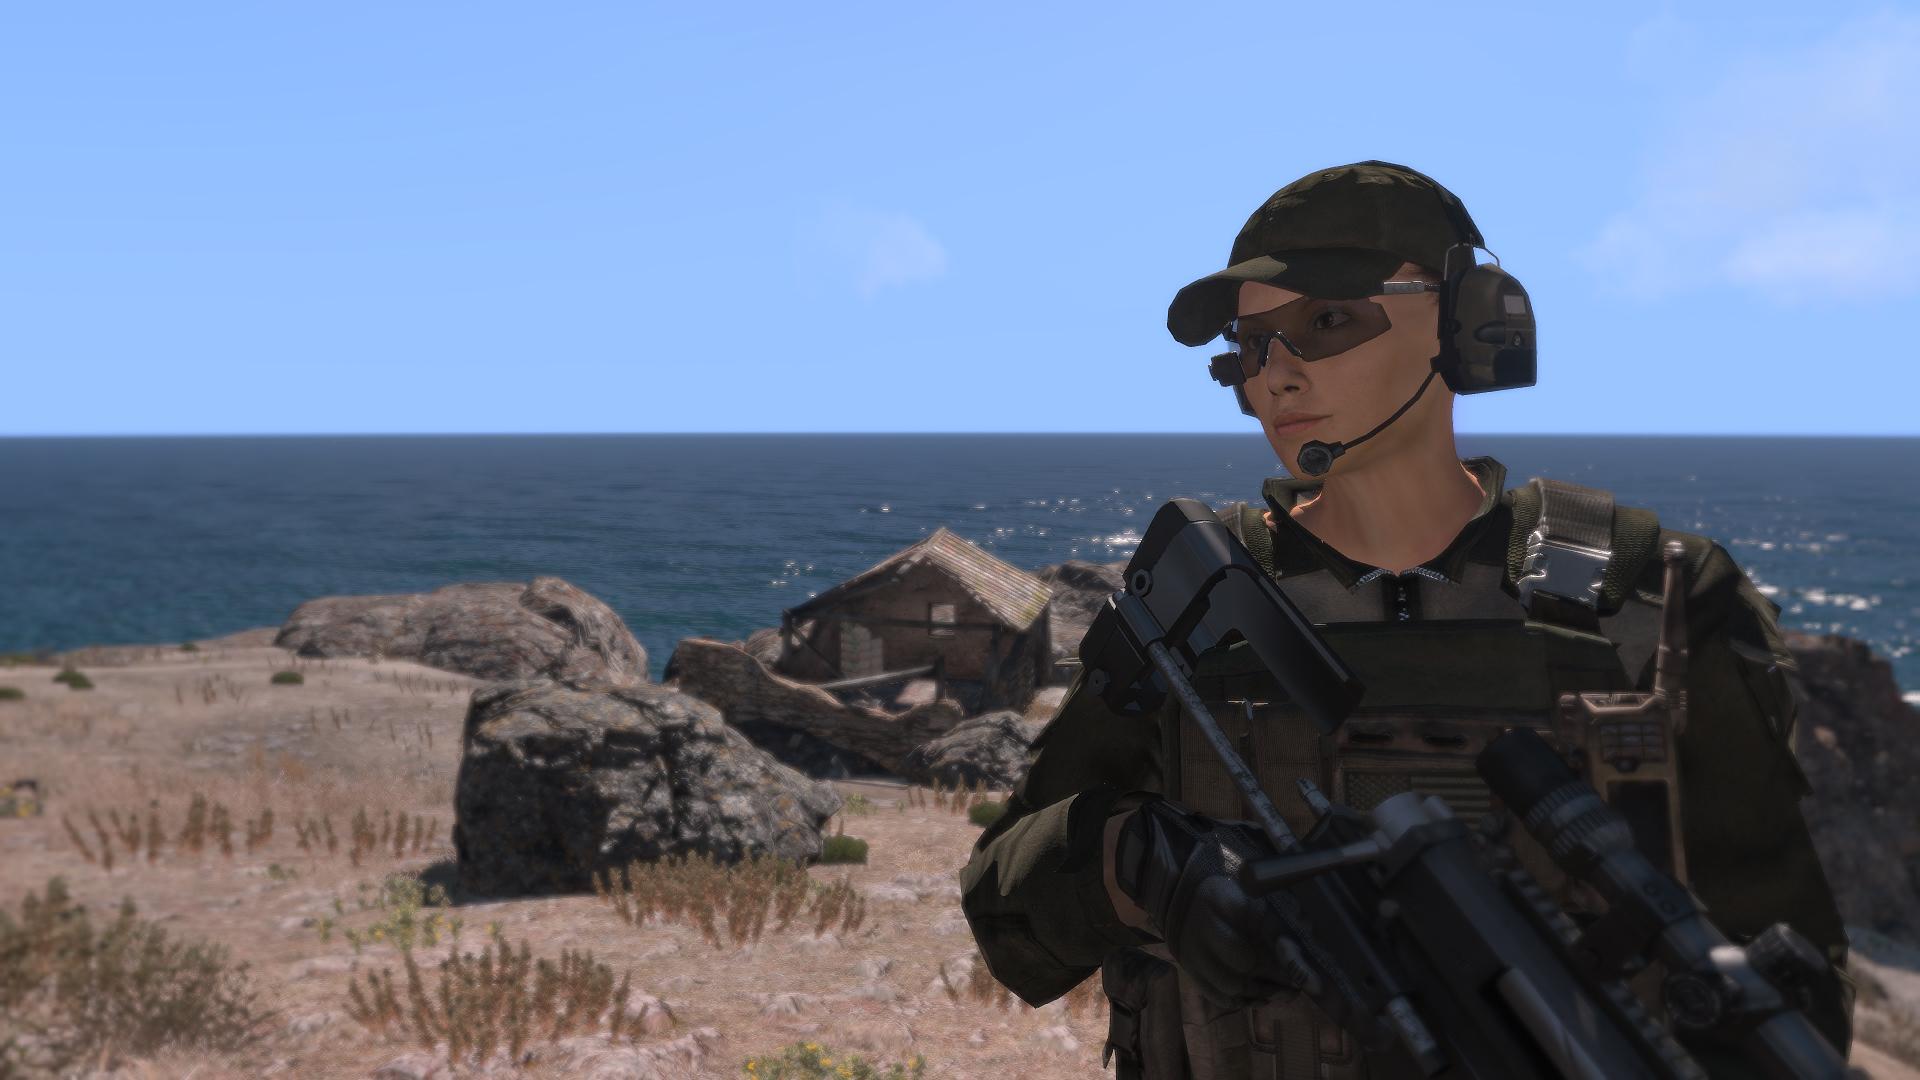 mason_at_the_beach_1_by_zeealex-d7u5opf.